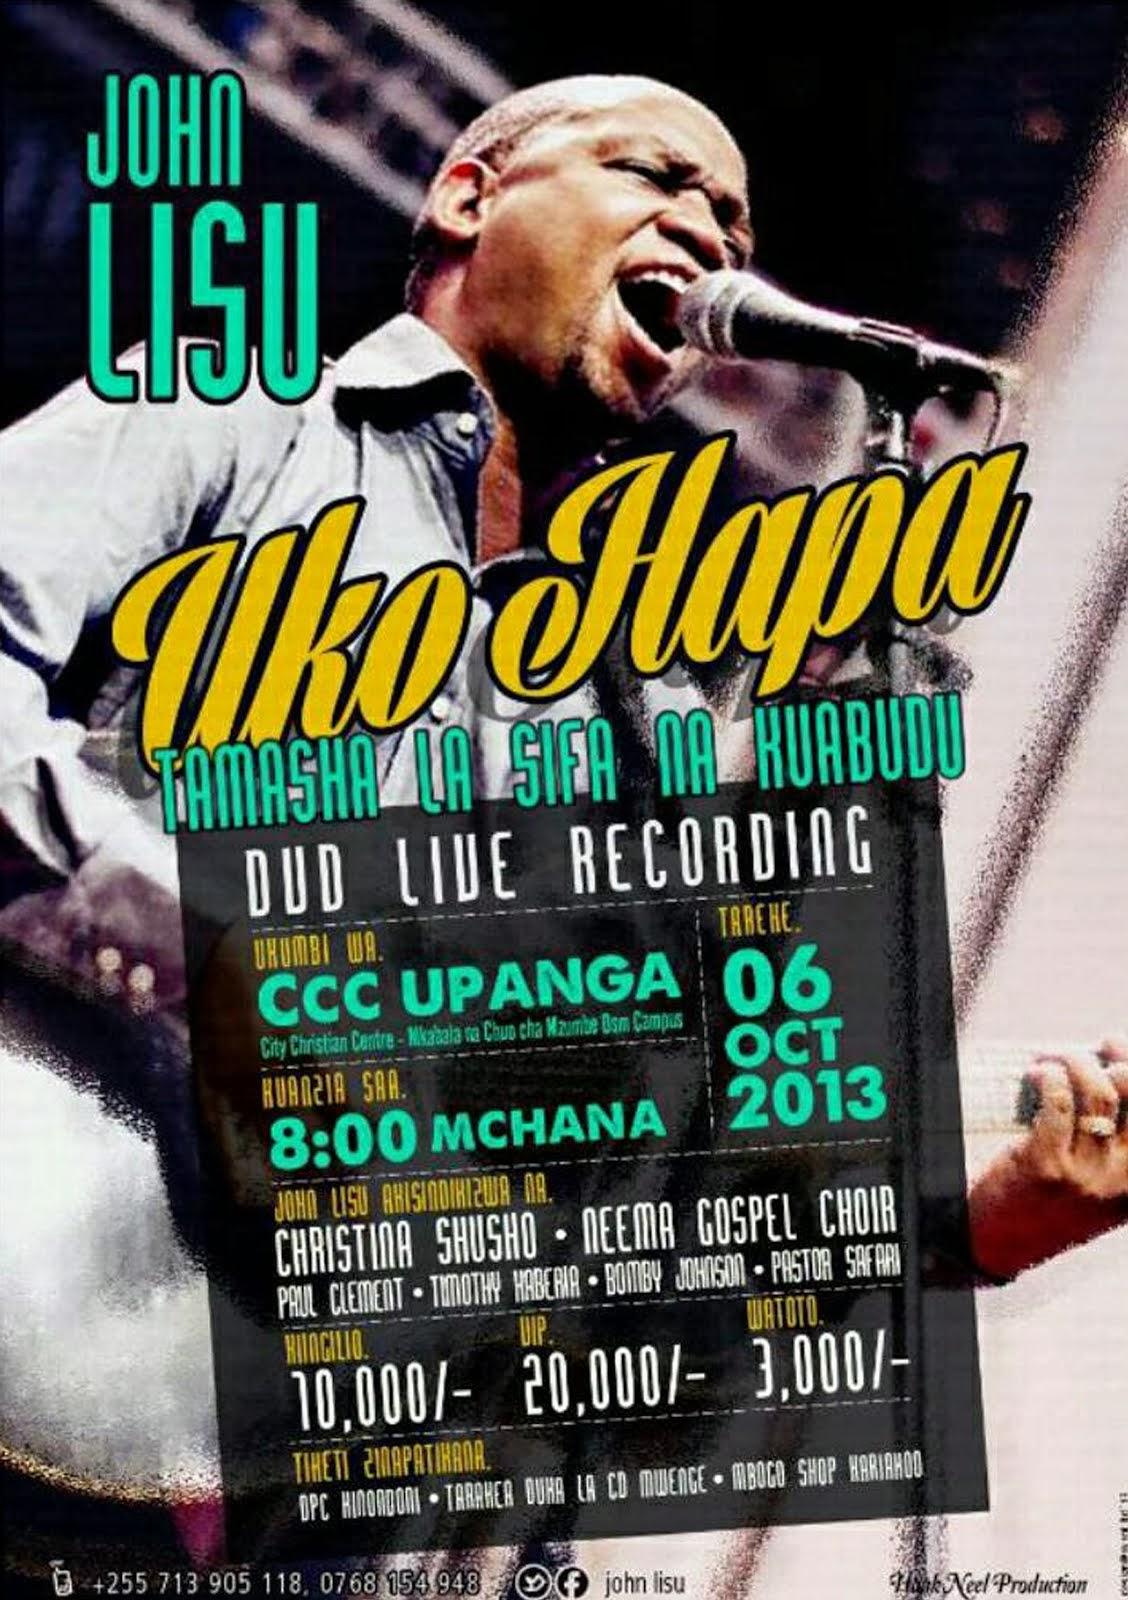 JOHN LISSU LIVE DVD RECORDING